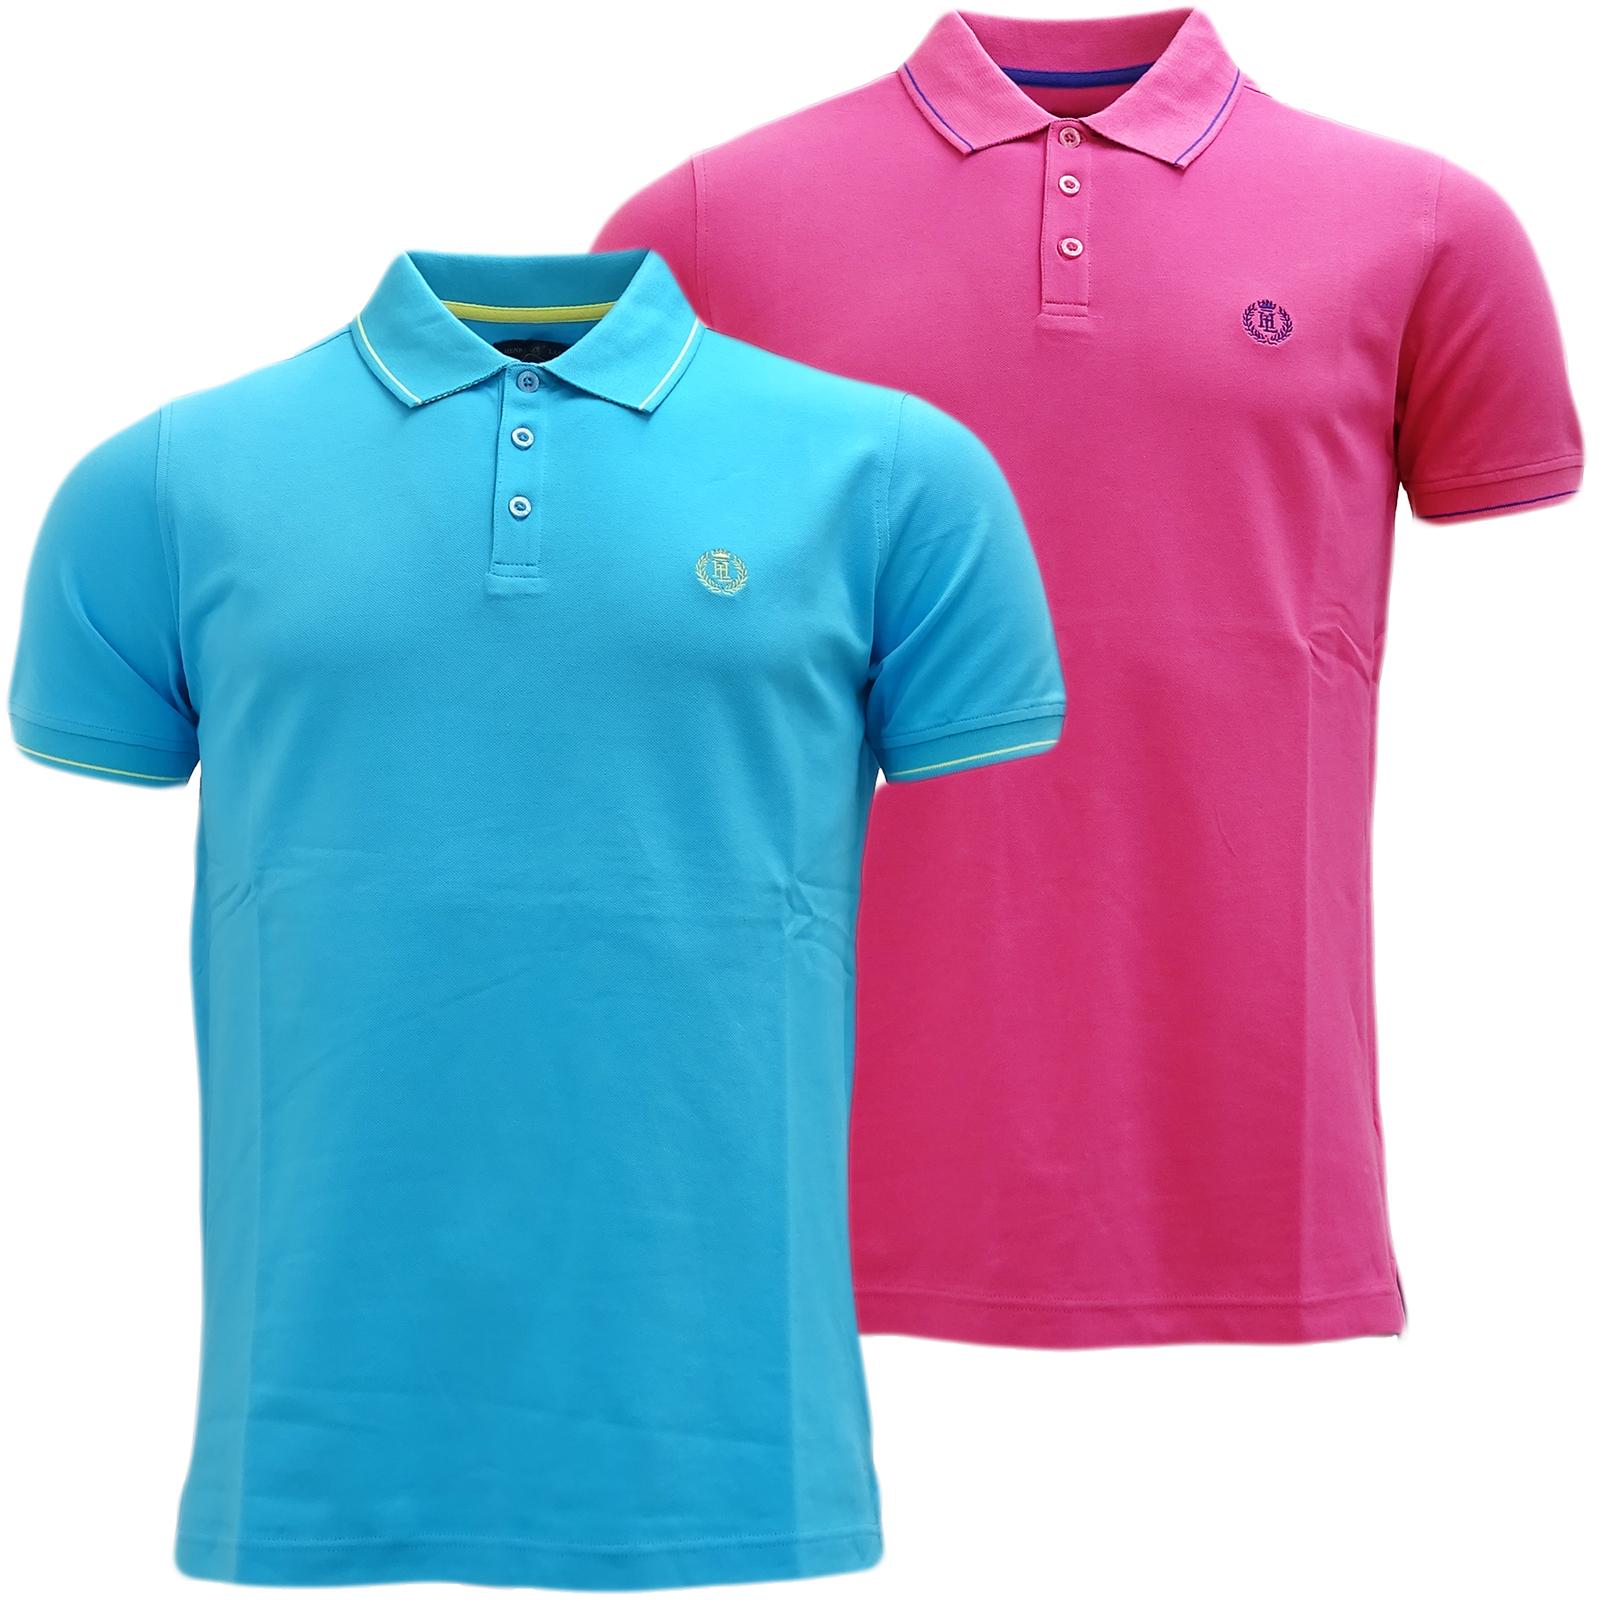 Henri Lloyd Plain Stripe Collar Stretch Polo Shirt Abington